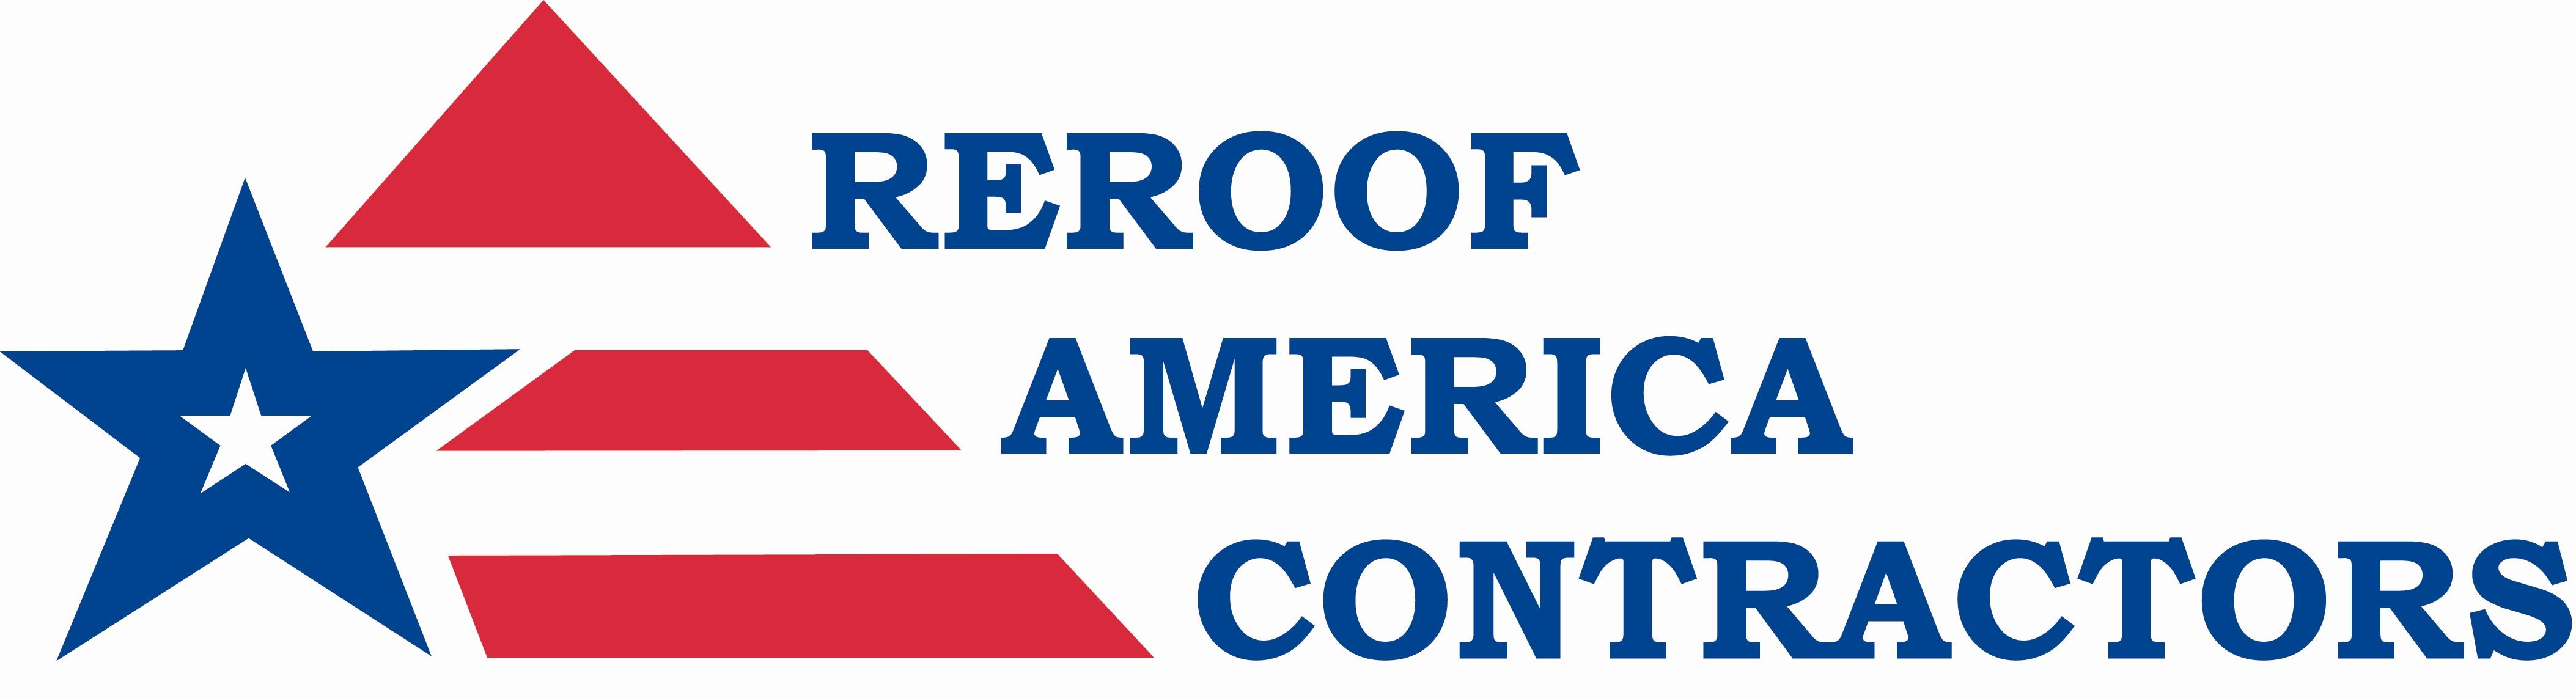 Reroof america contractors kansas city mo the local for America s best contractors